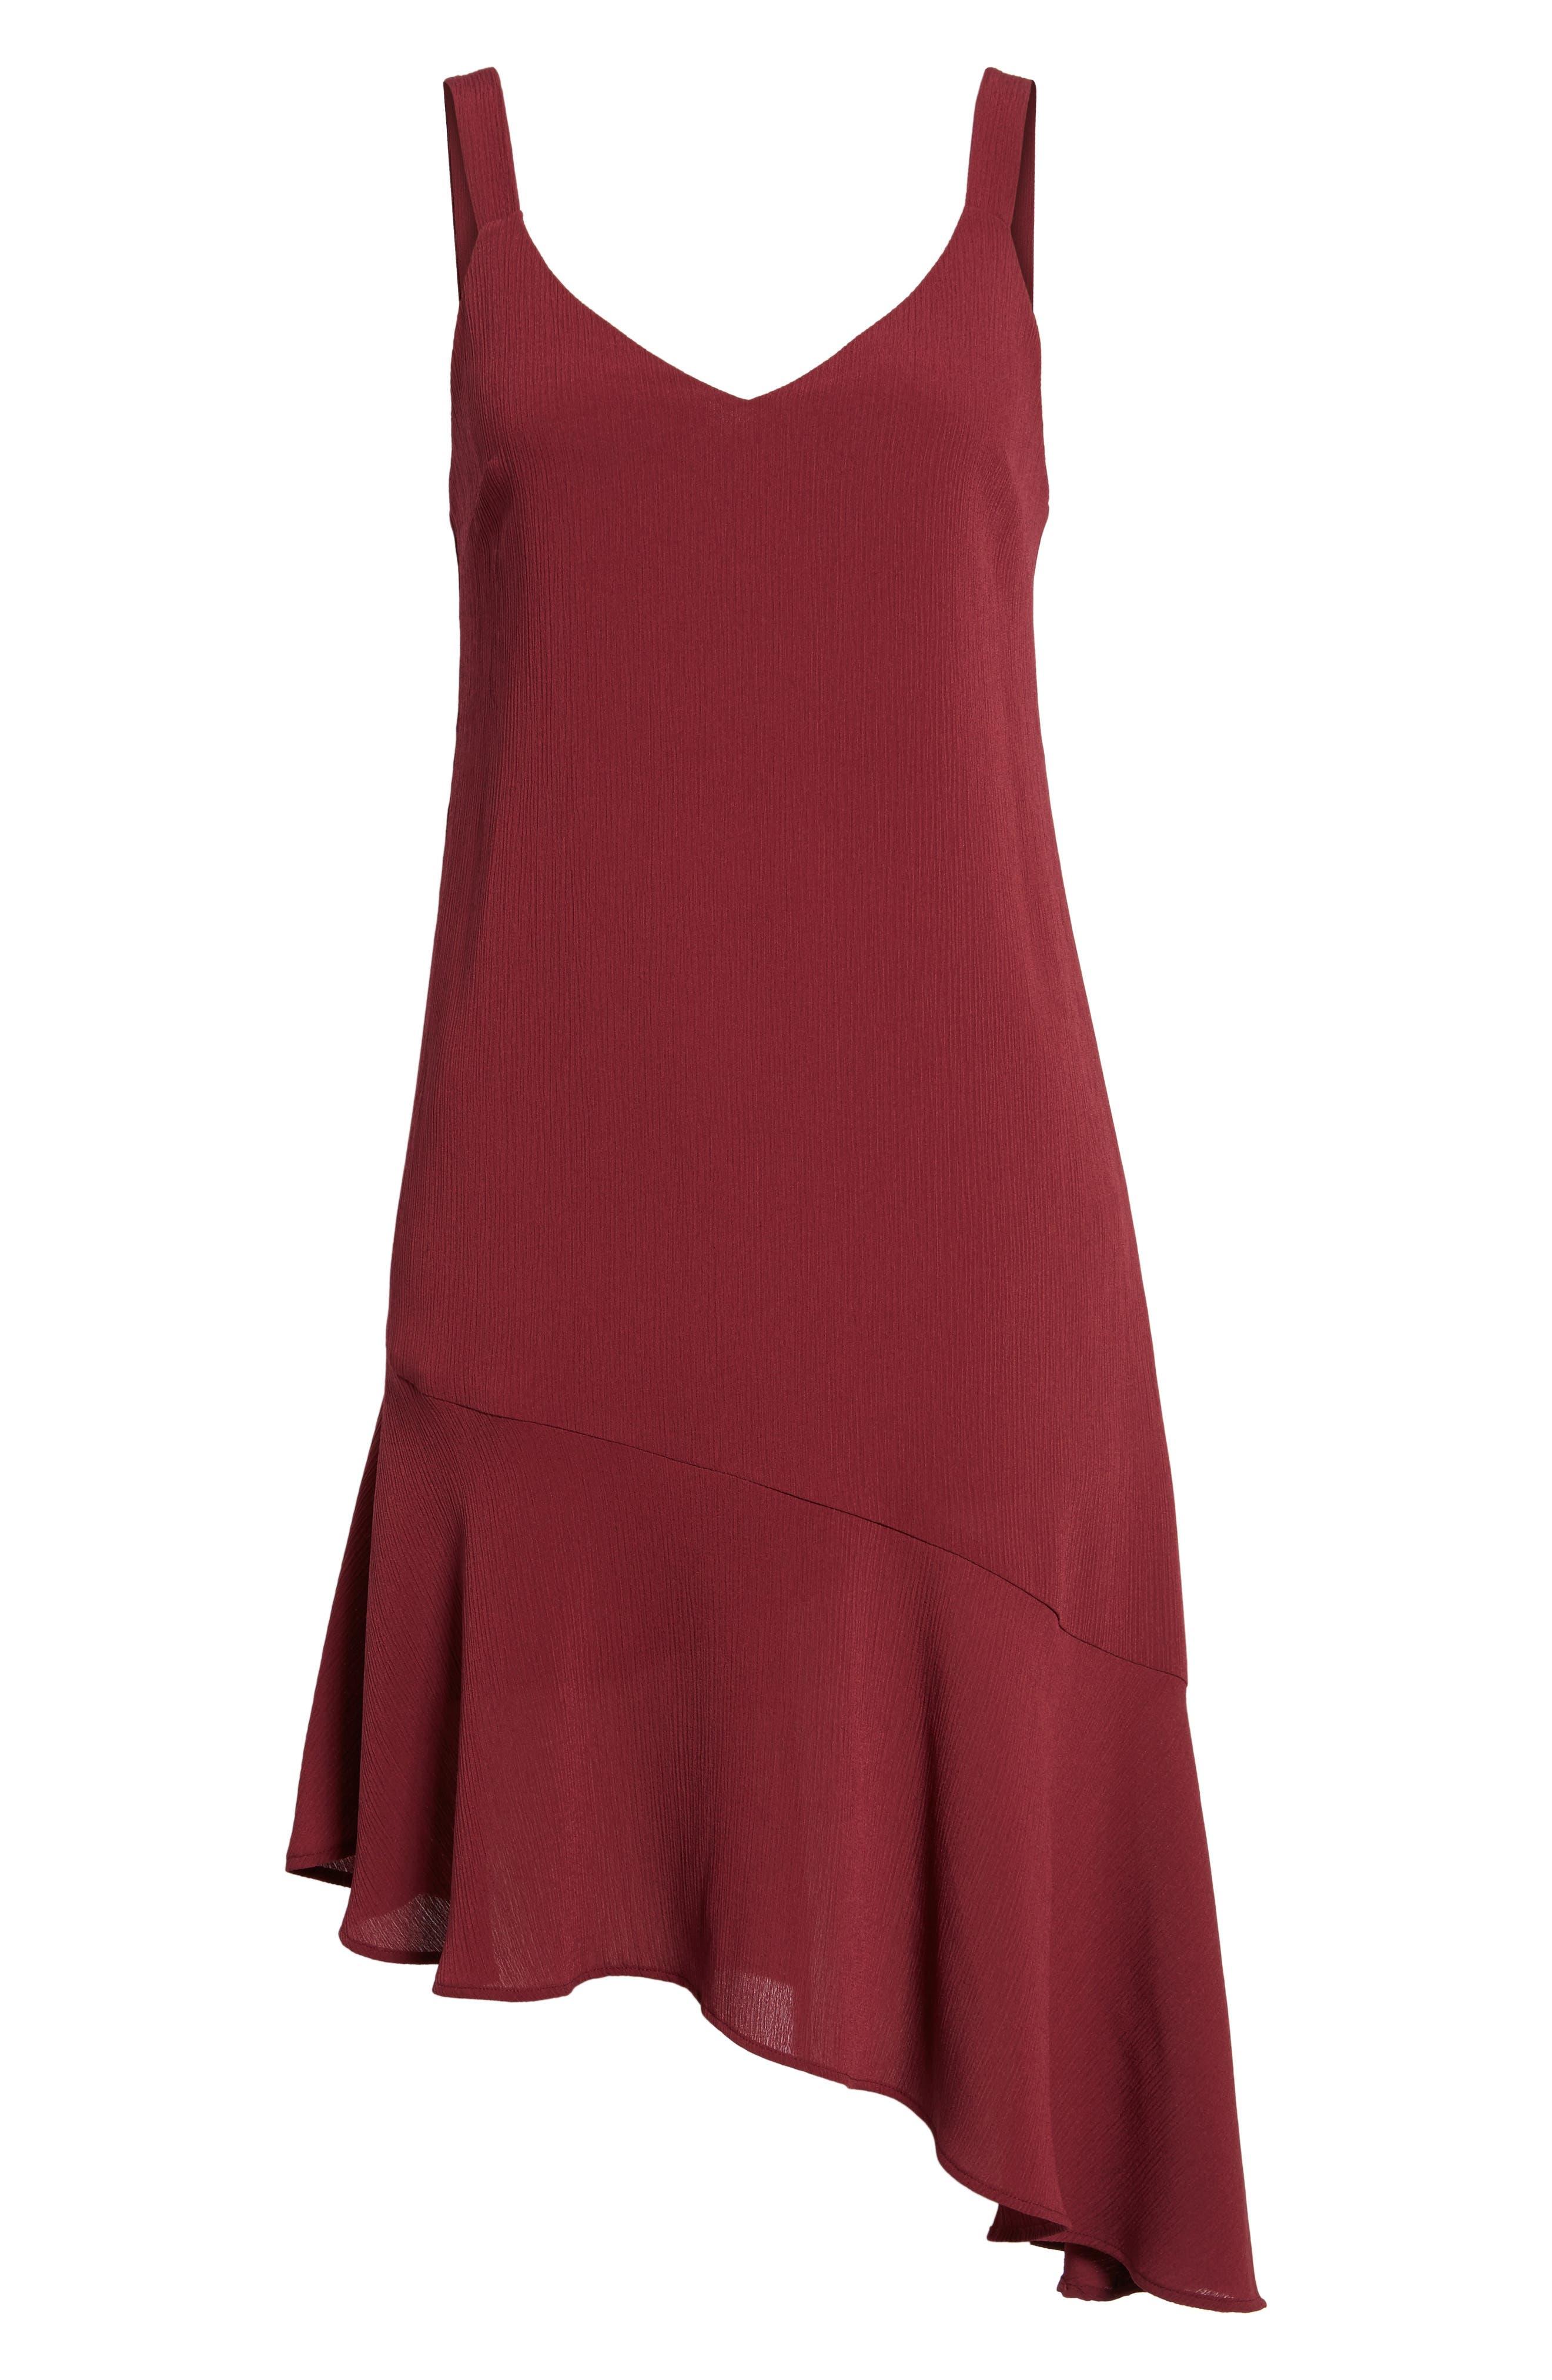 Asymmetrical Ruffle Hem Dress,                             Alternate thumbnail 6, color,                             Red Tannin